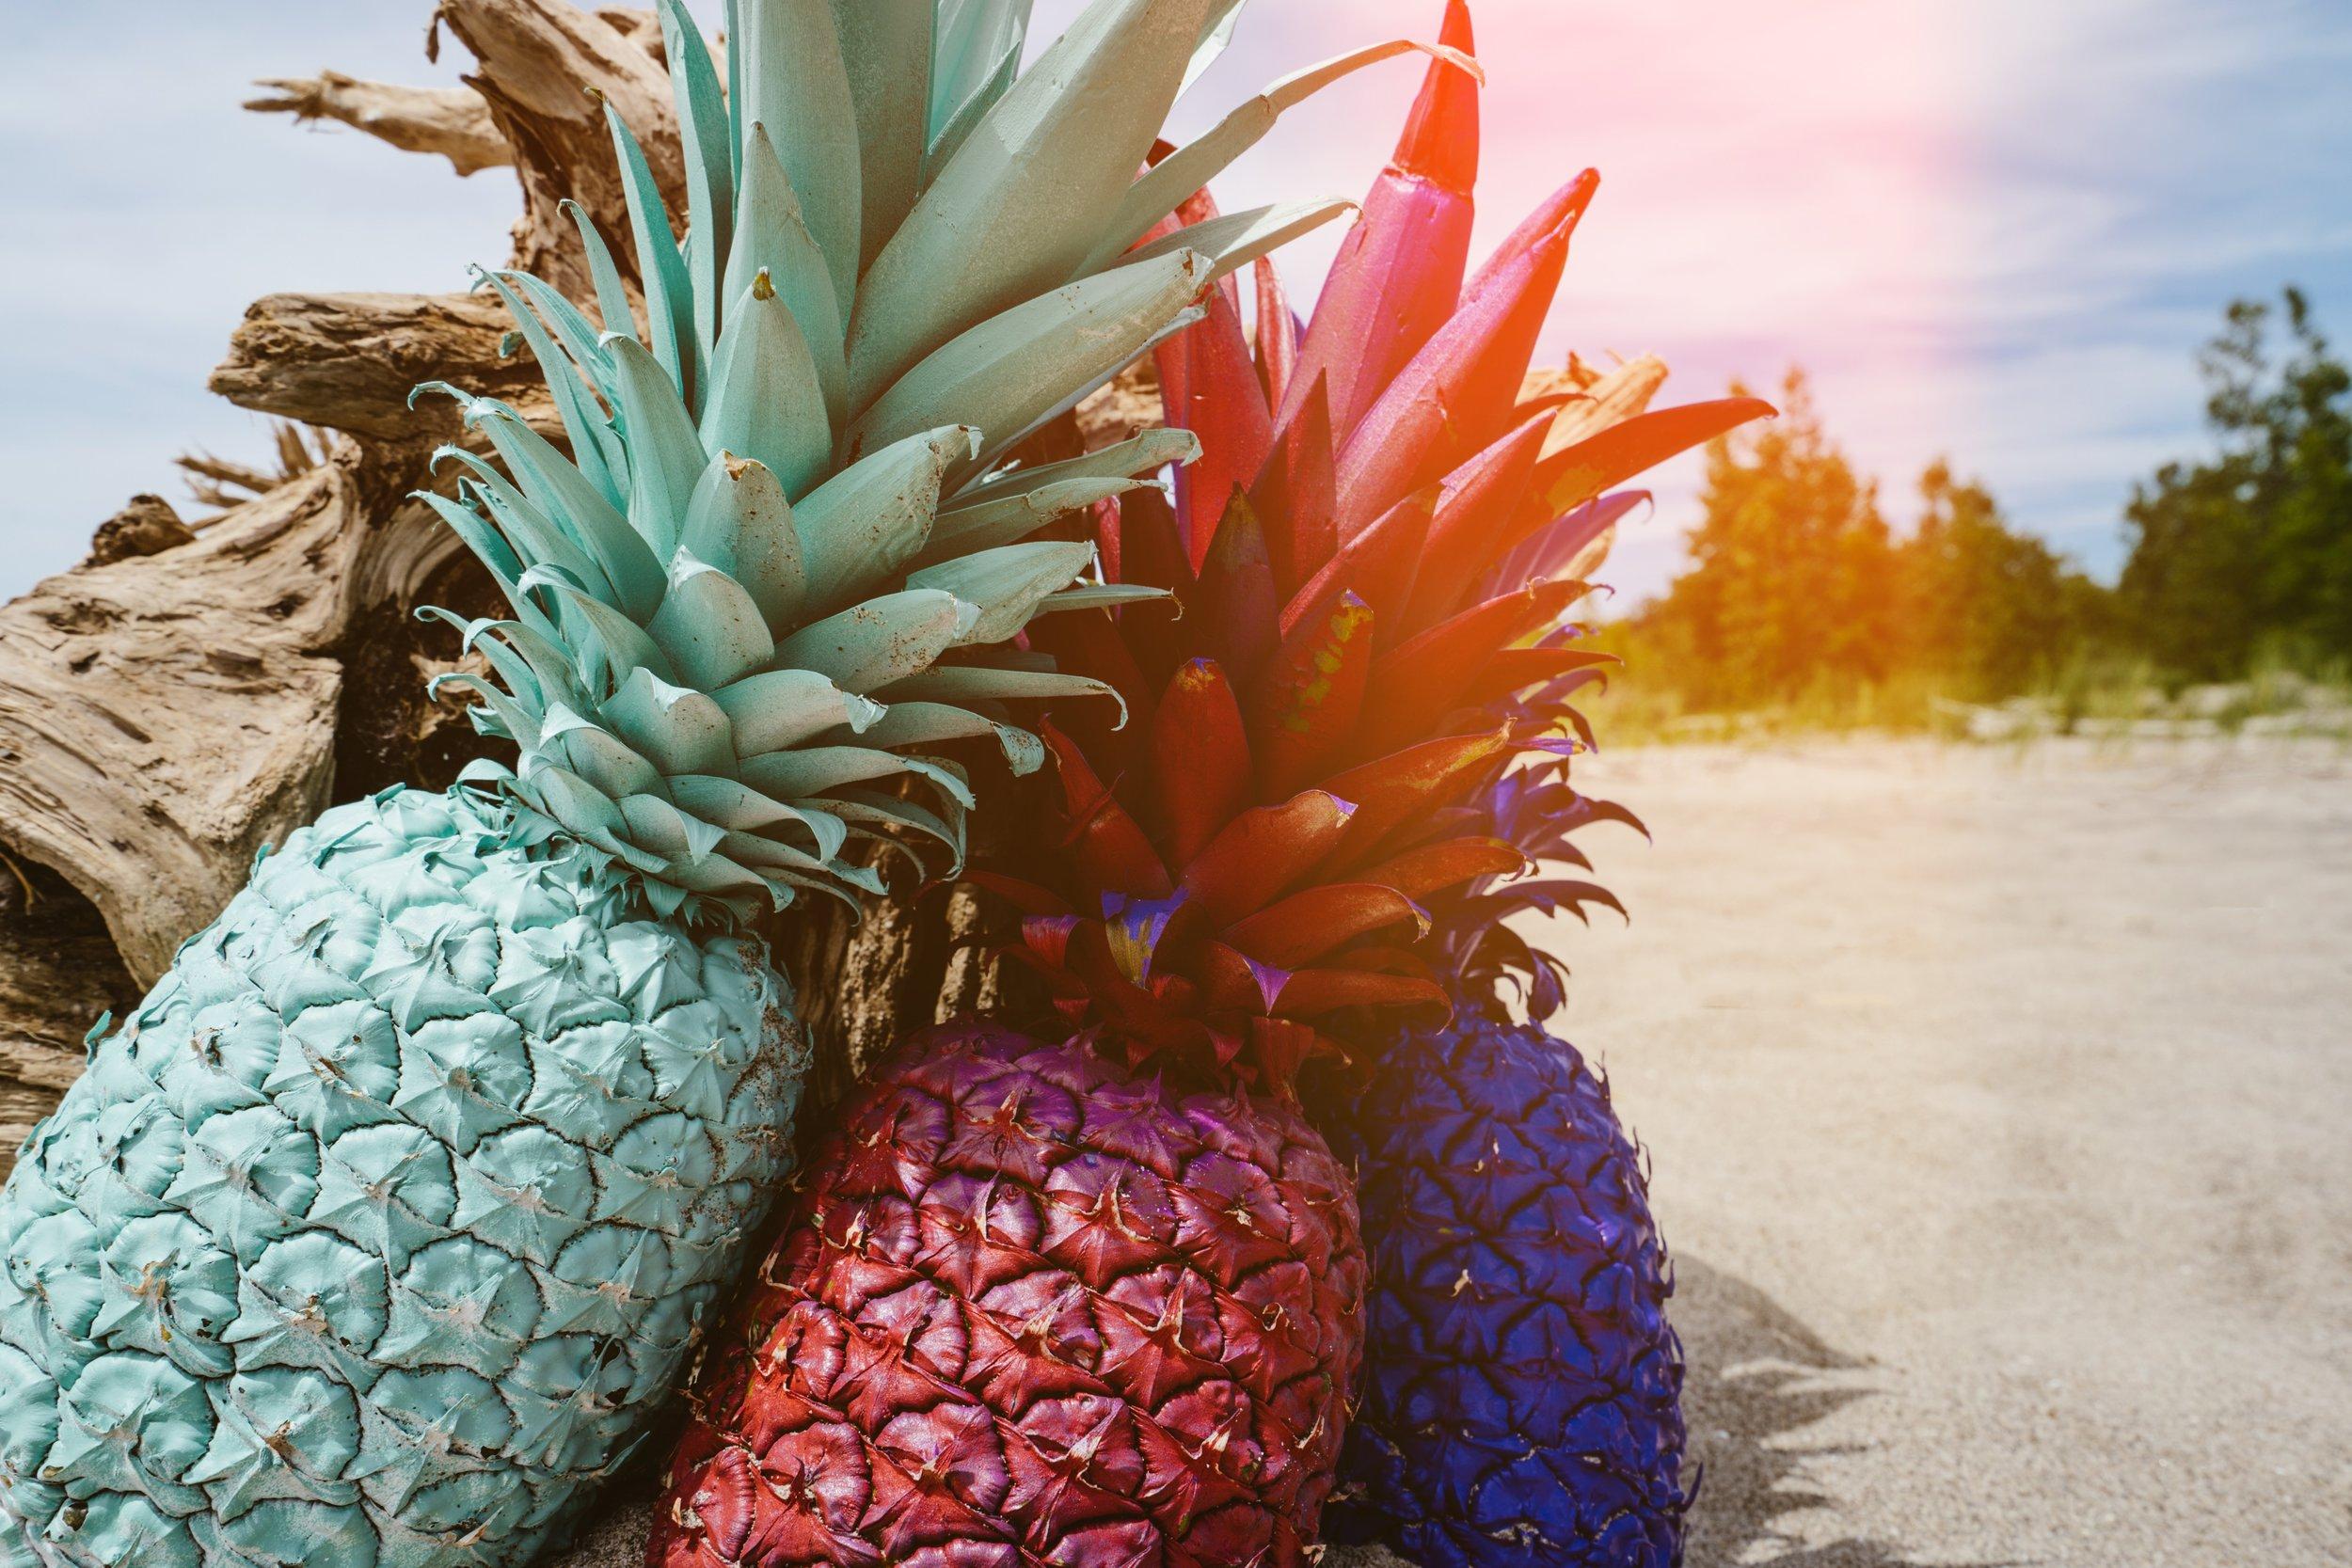 pineapple-supply-co-119643-unsplash.jpg